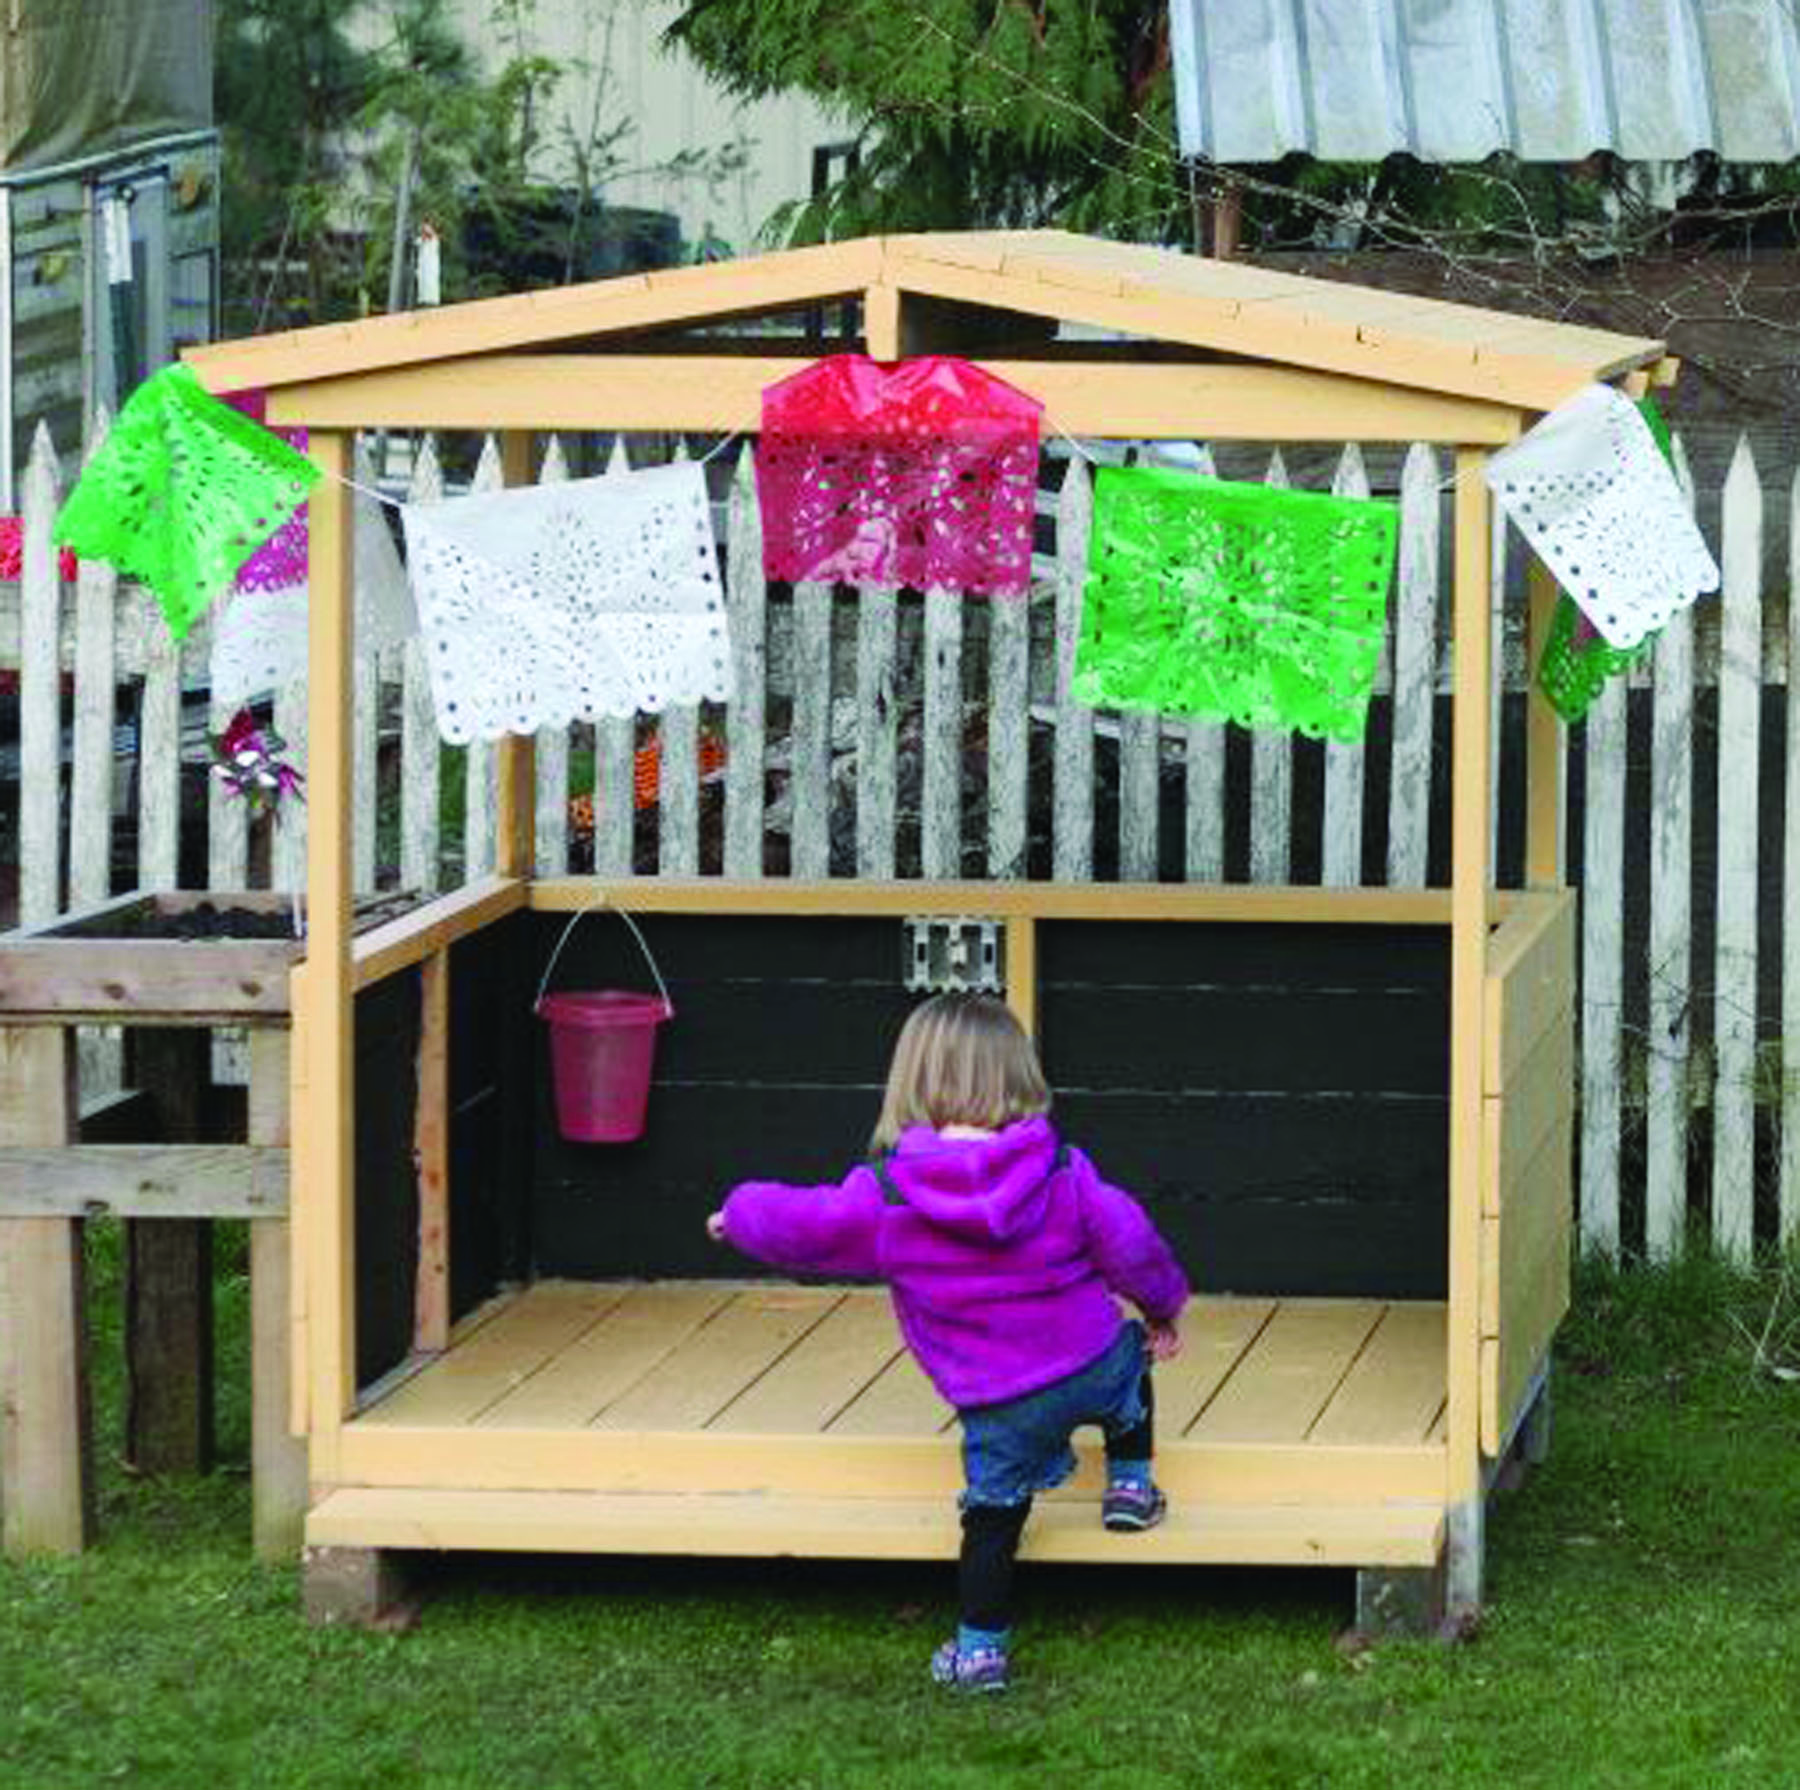 http://www.grownorthwest.com/wp-content/uploads/2012/06/pallet-playhouse.jpg